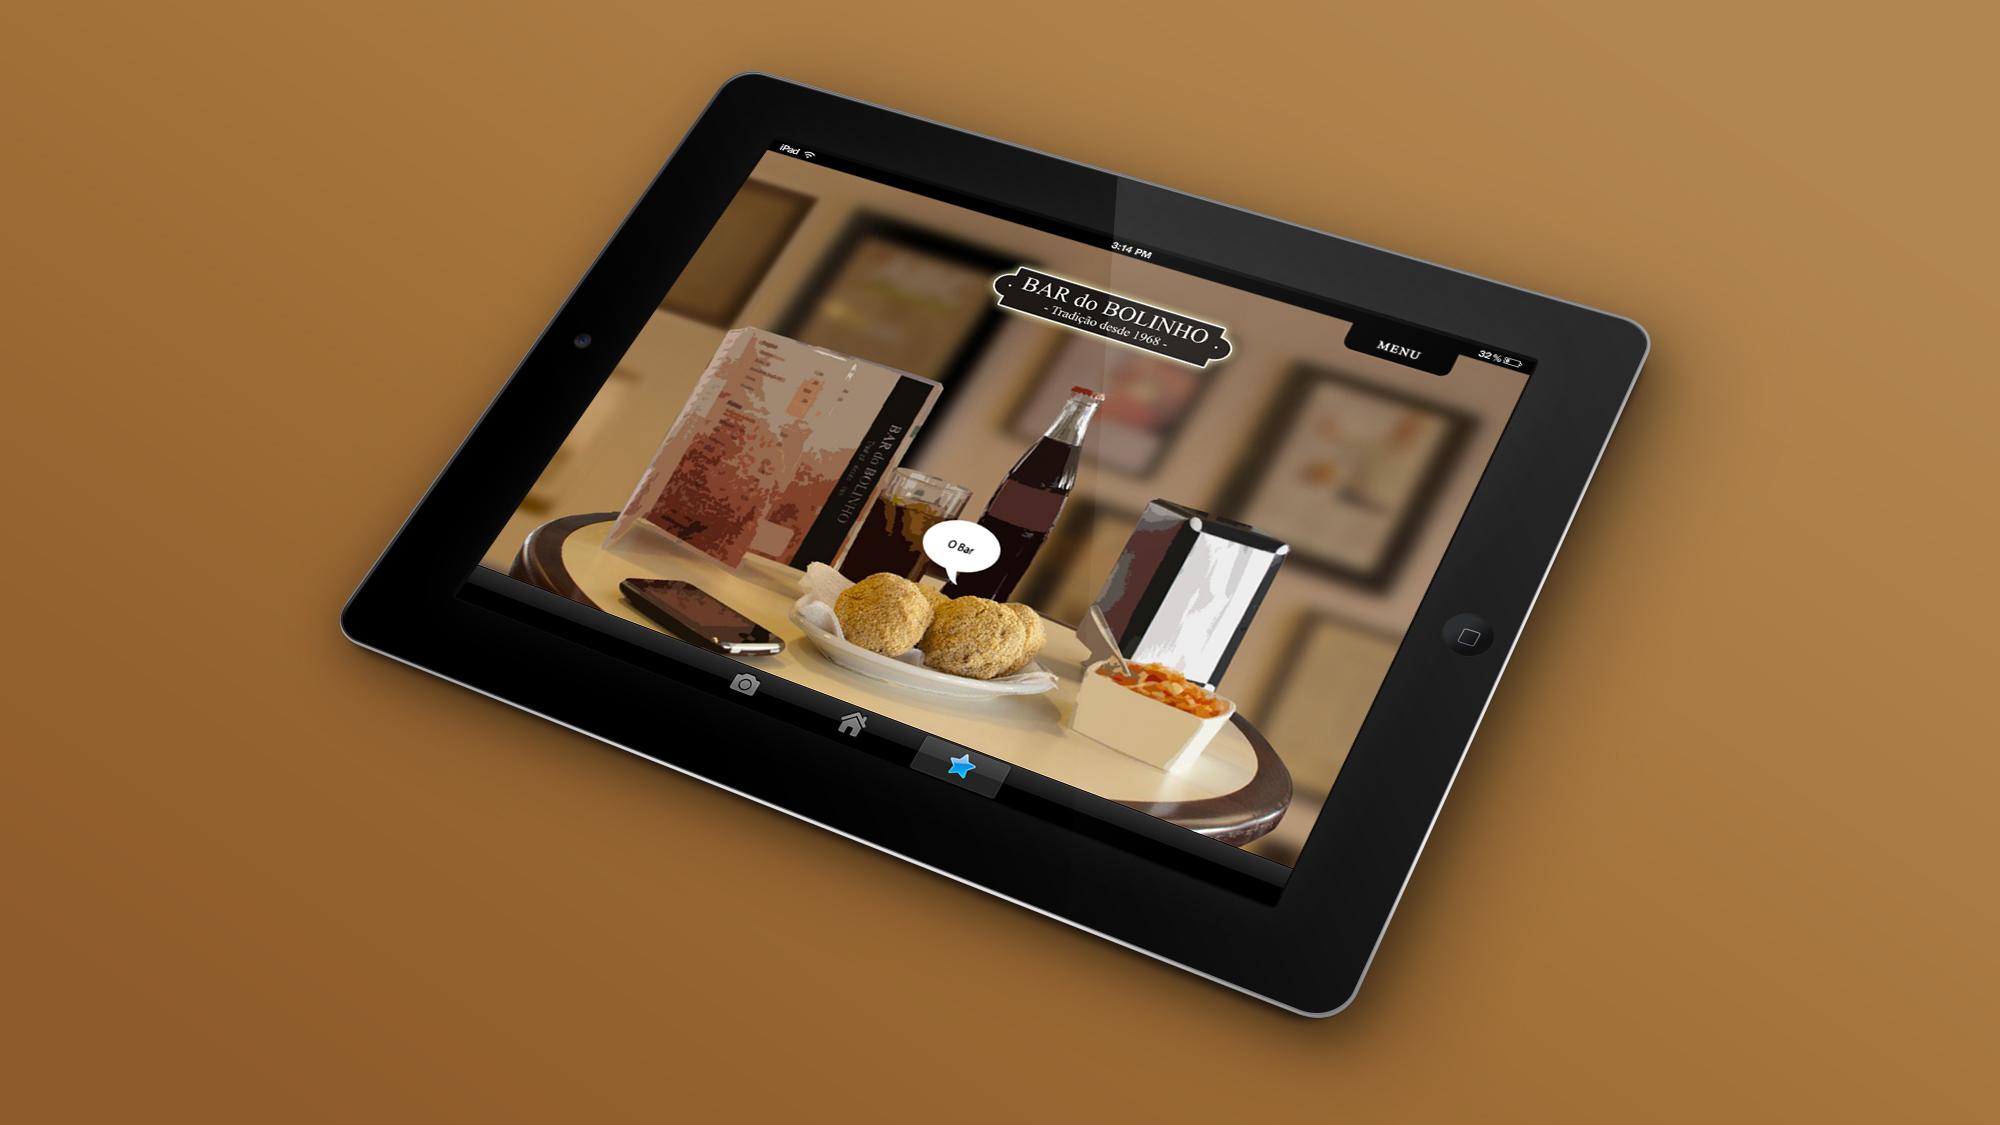 iPad2-Black-Perspective-View-Landscape-Mockup